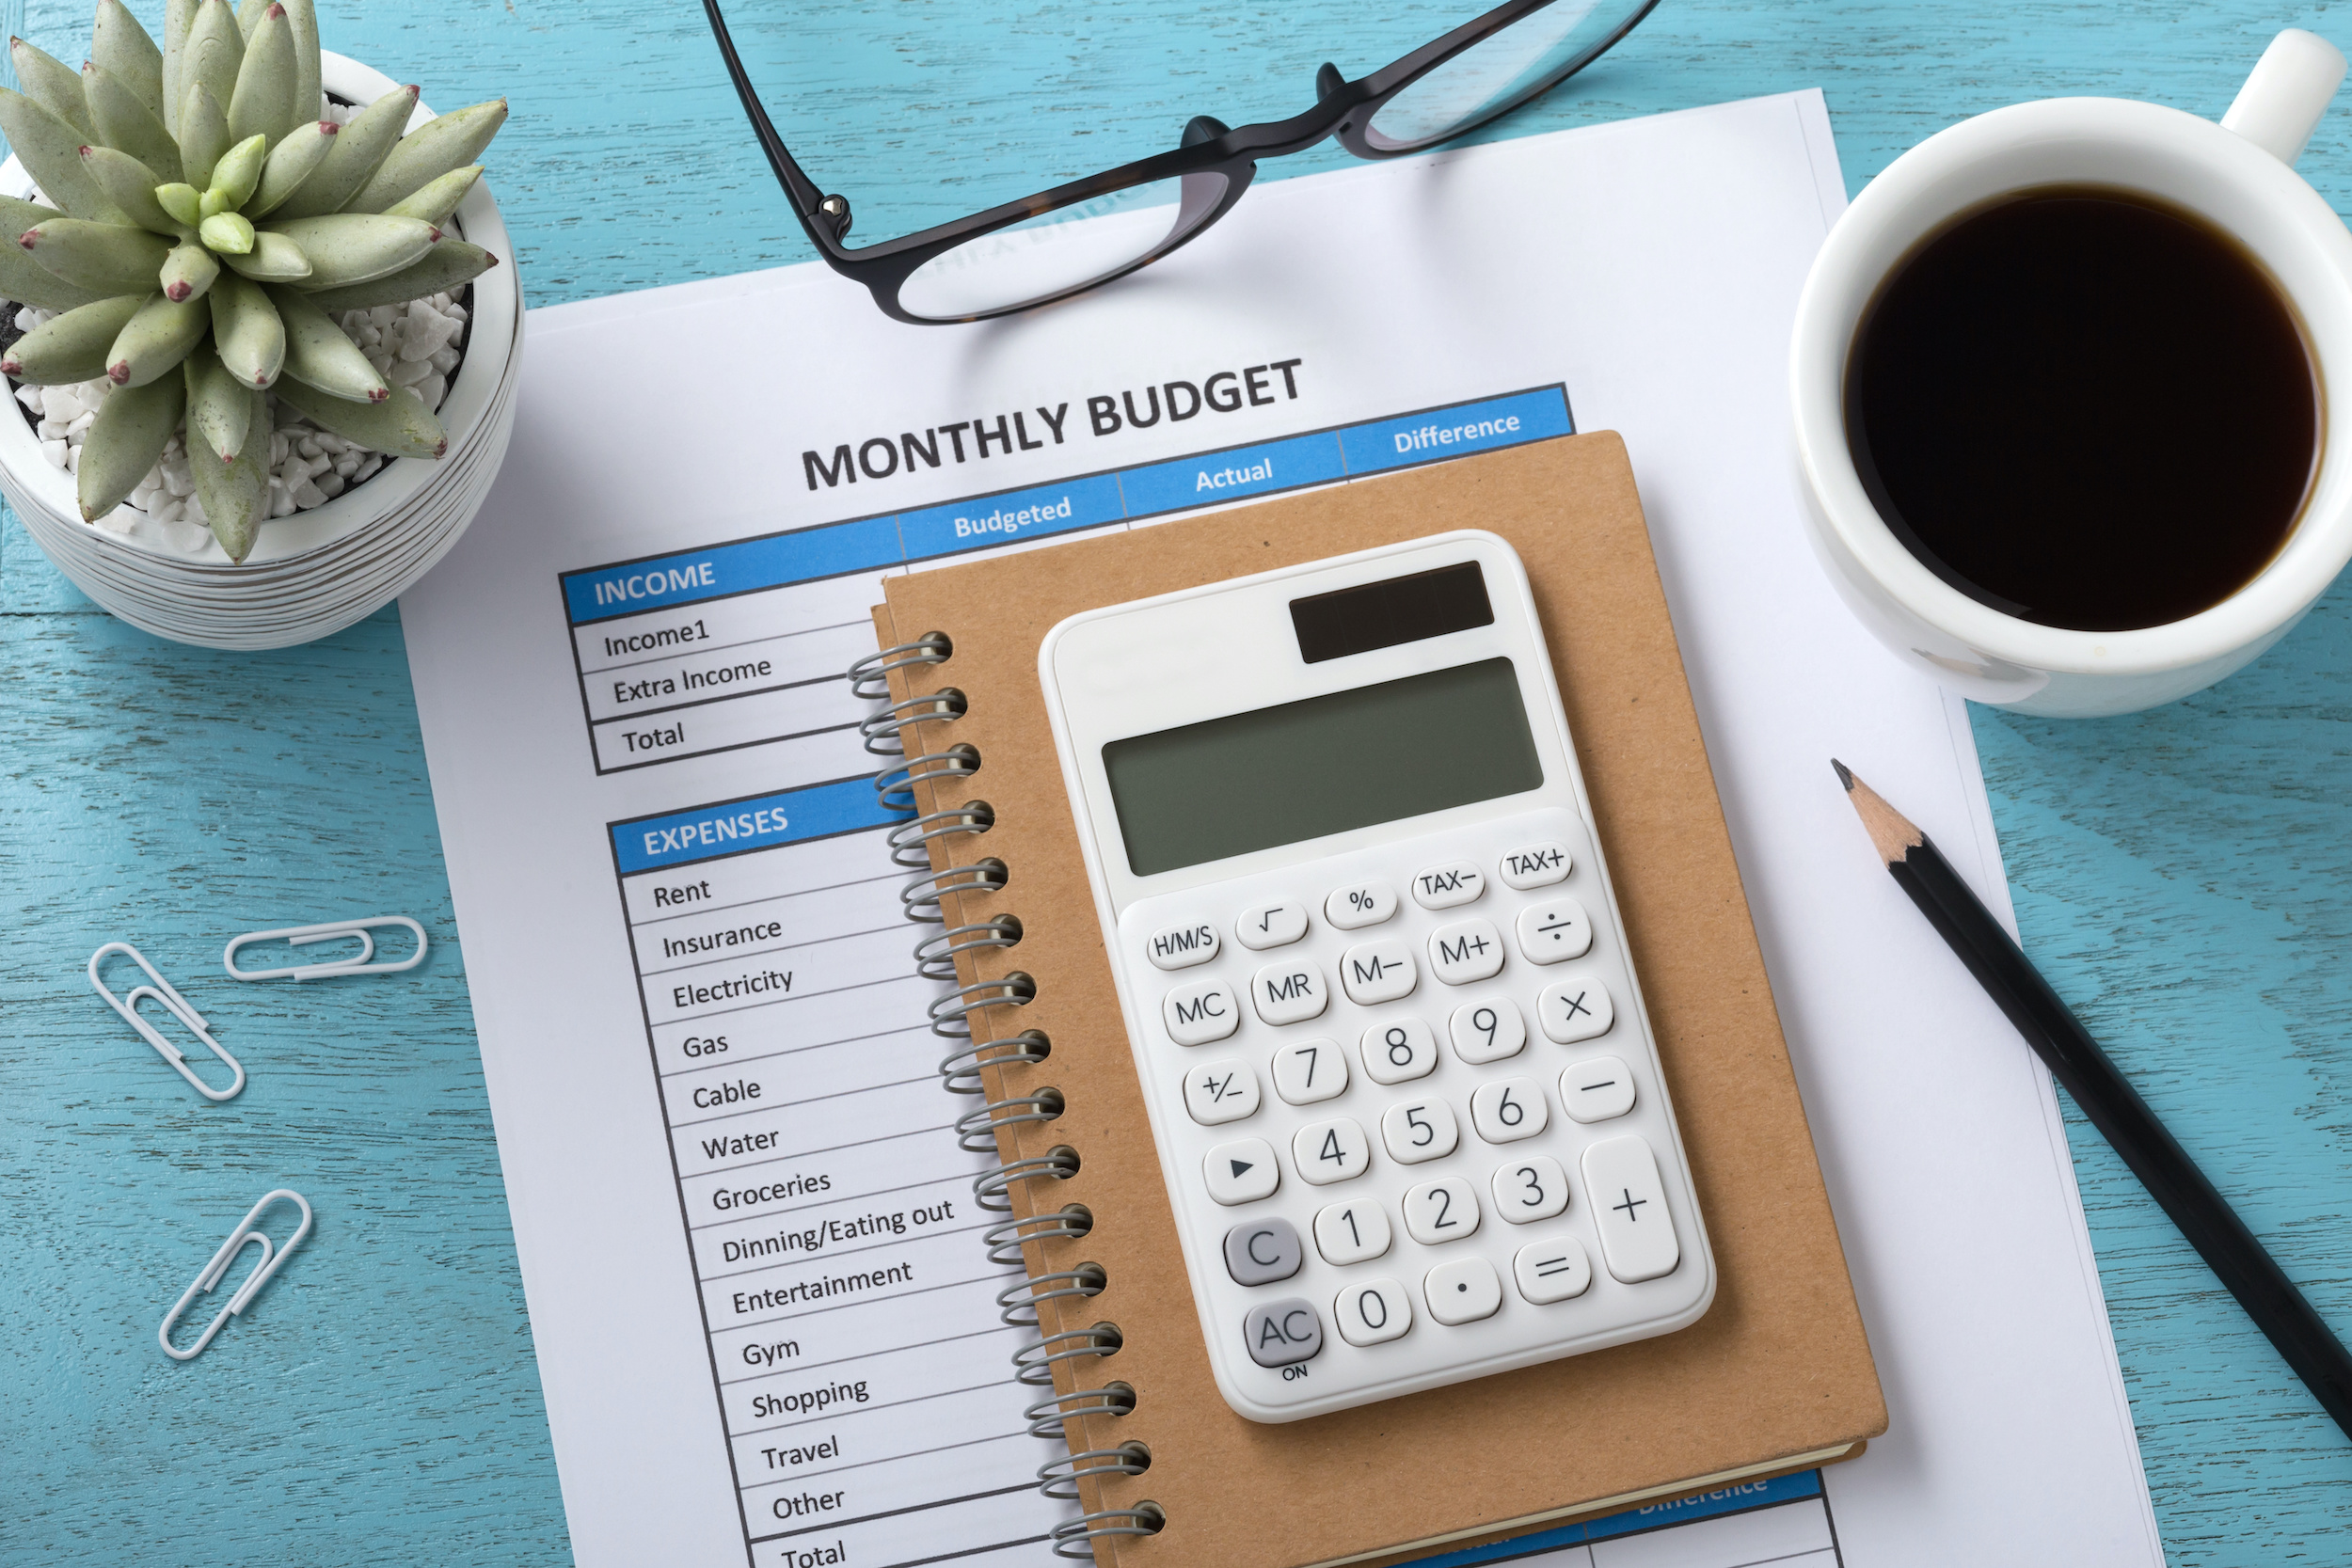 Monthly budget savings